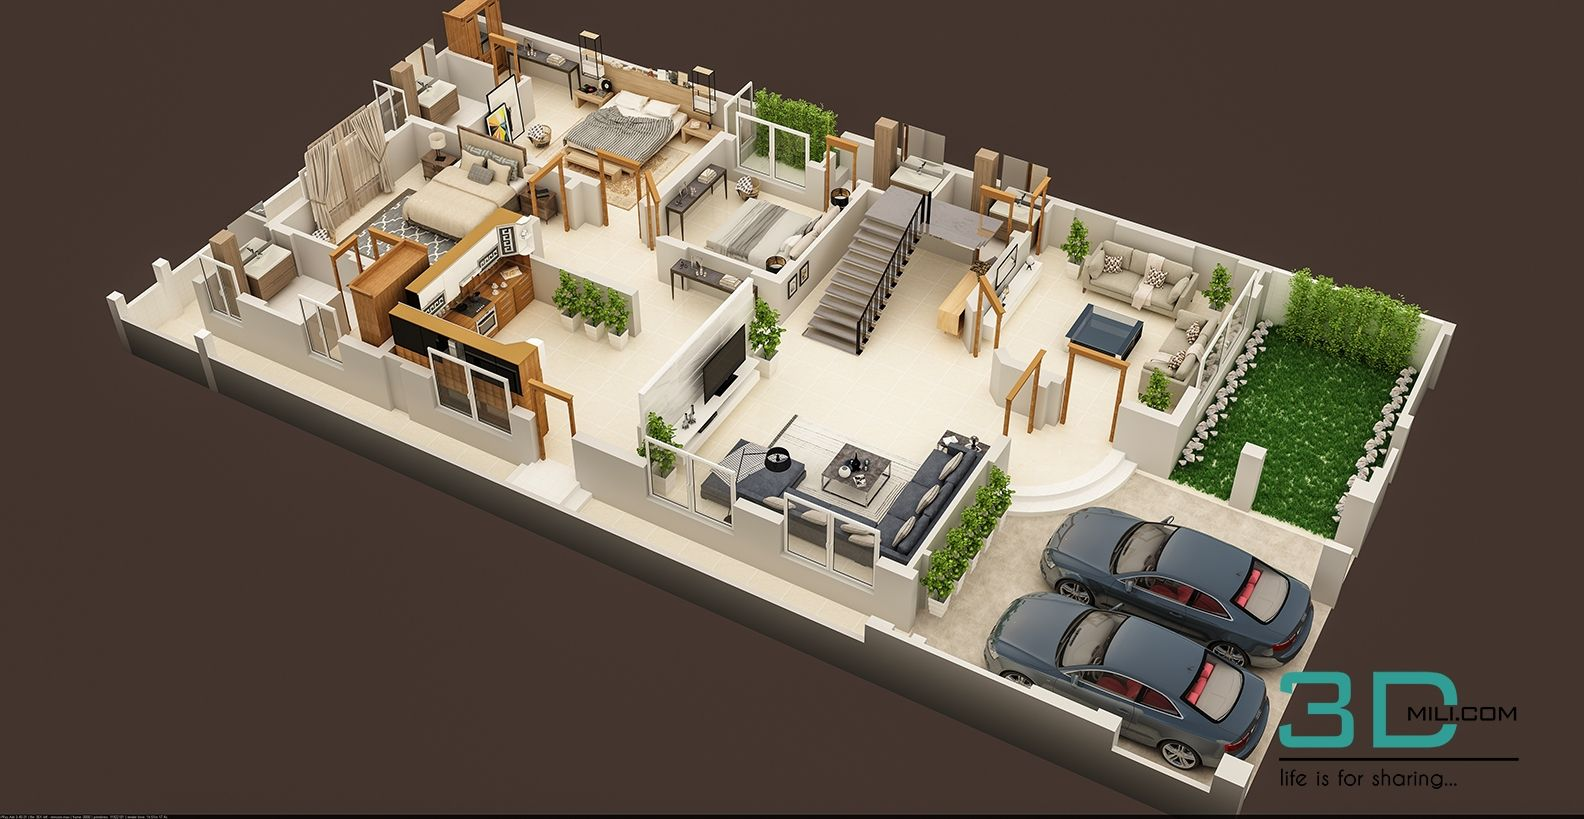 3d Floor Plan Of Residential House Ground Floor Plan Home Design Floor Plans Ground Floor Plan Floor Plan Design